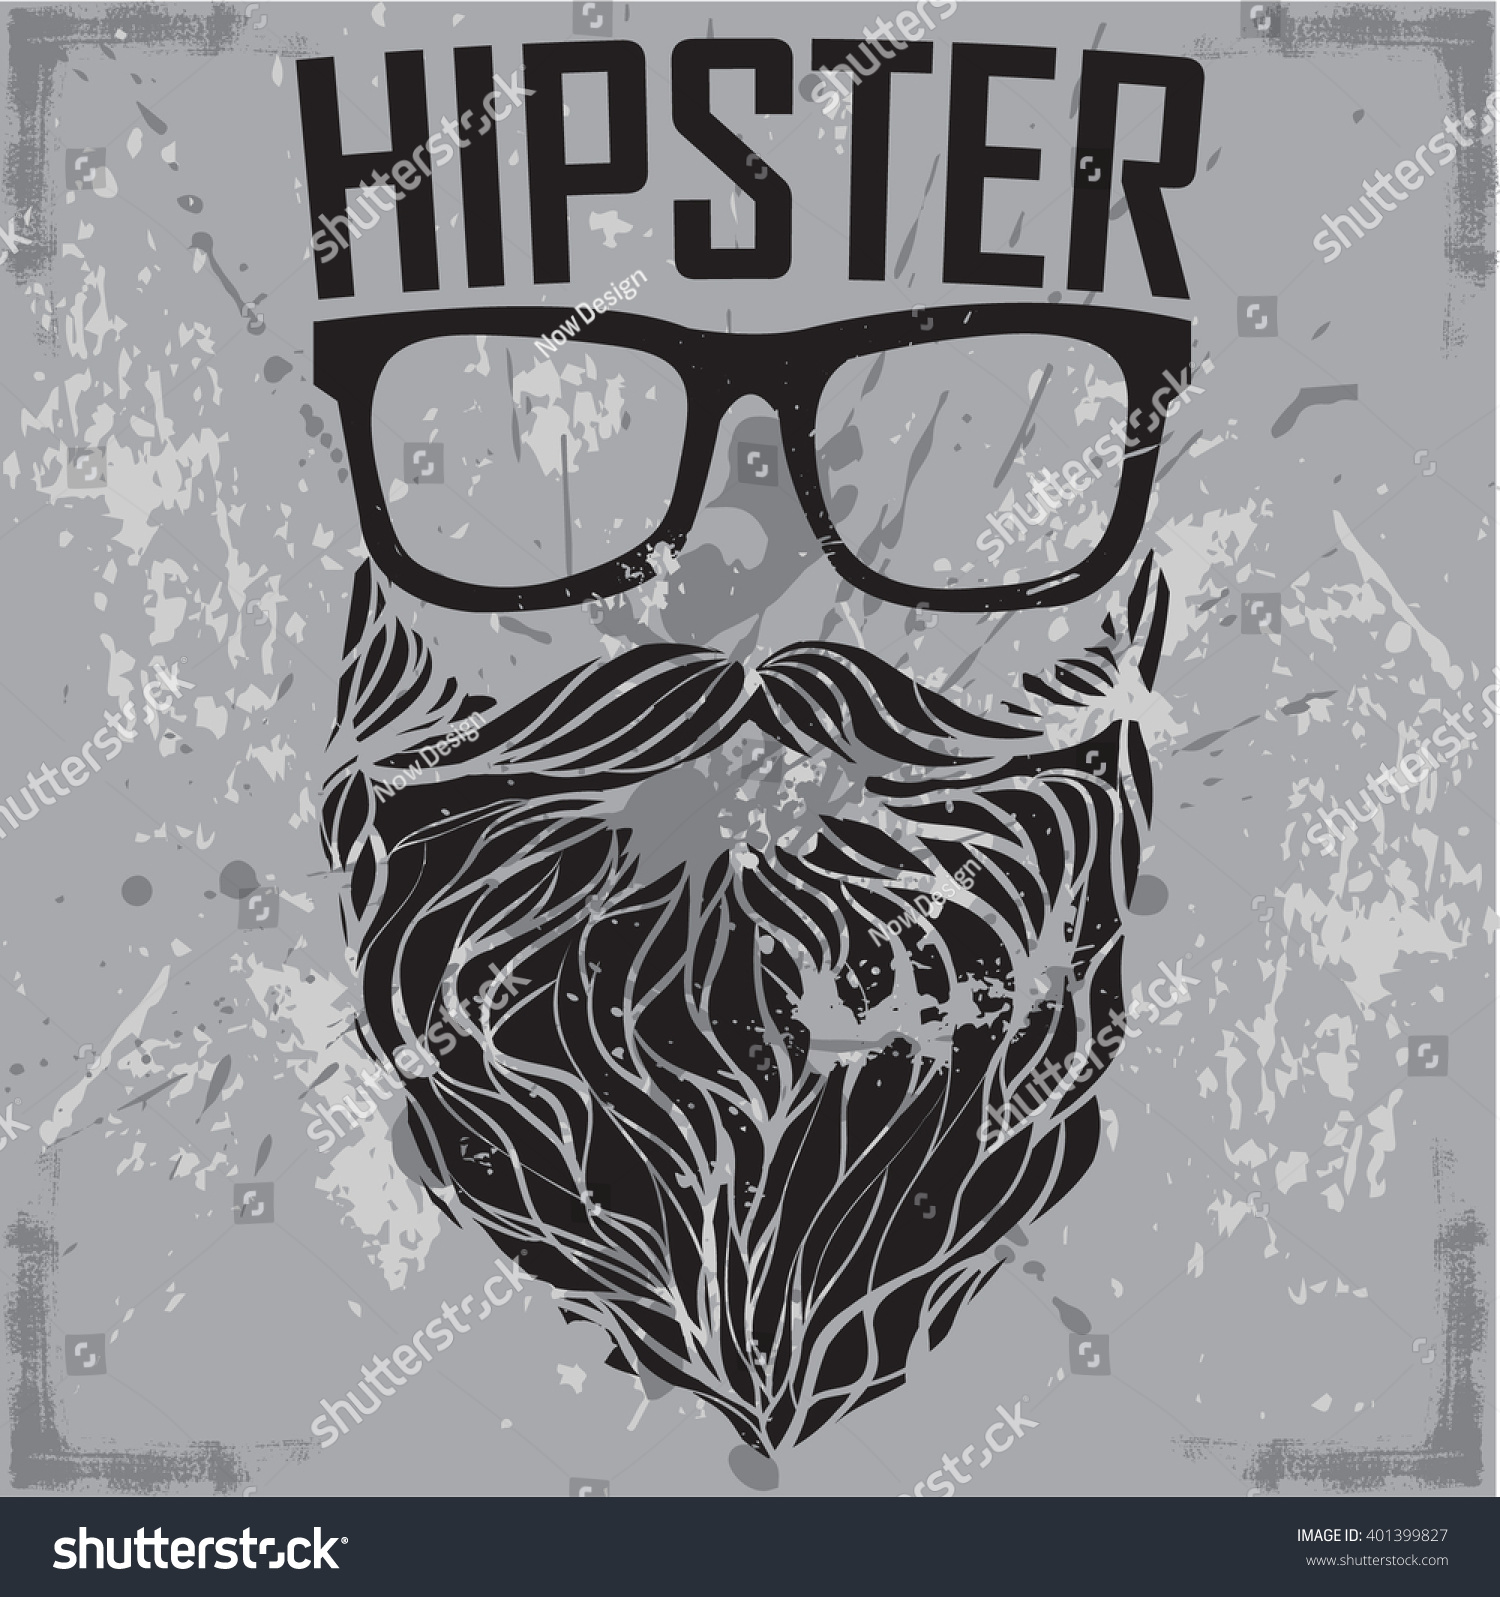 Hipster Print Tshirt Hipster Sunglasses Beard Stock Vector ...